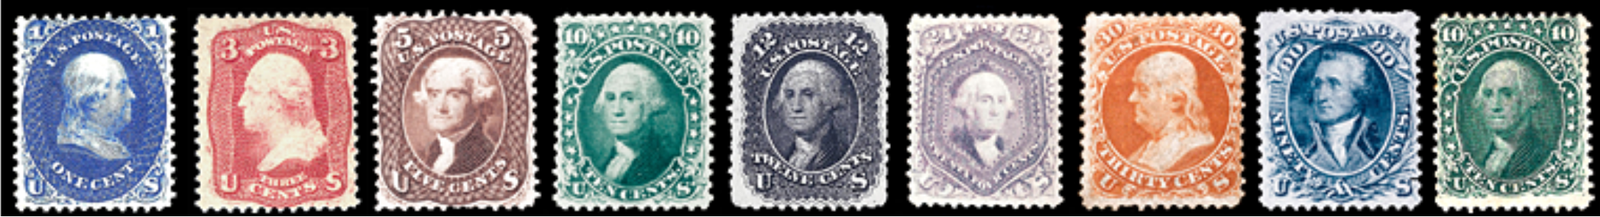 RLS Stamps